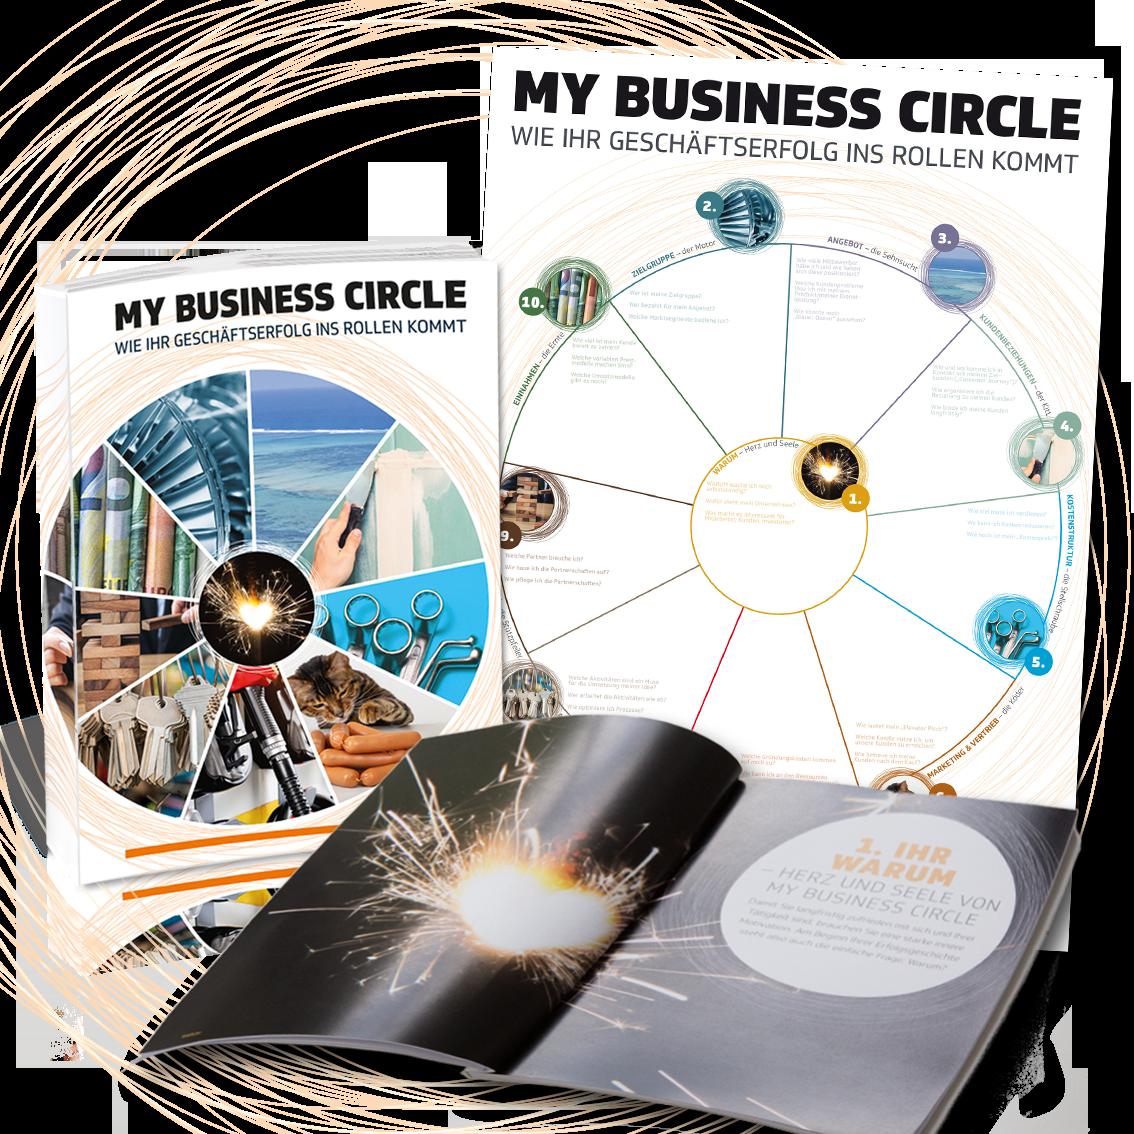 https://www.mybusinesscircle.de/wp-content/uploads/2019/06/Buch-Teaser-.png